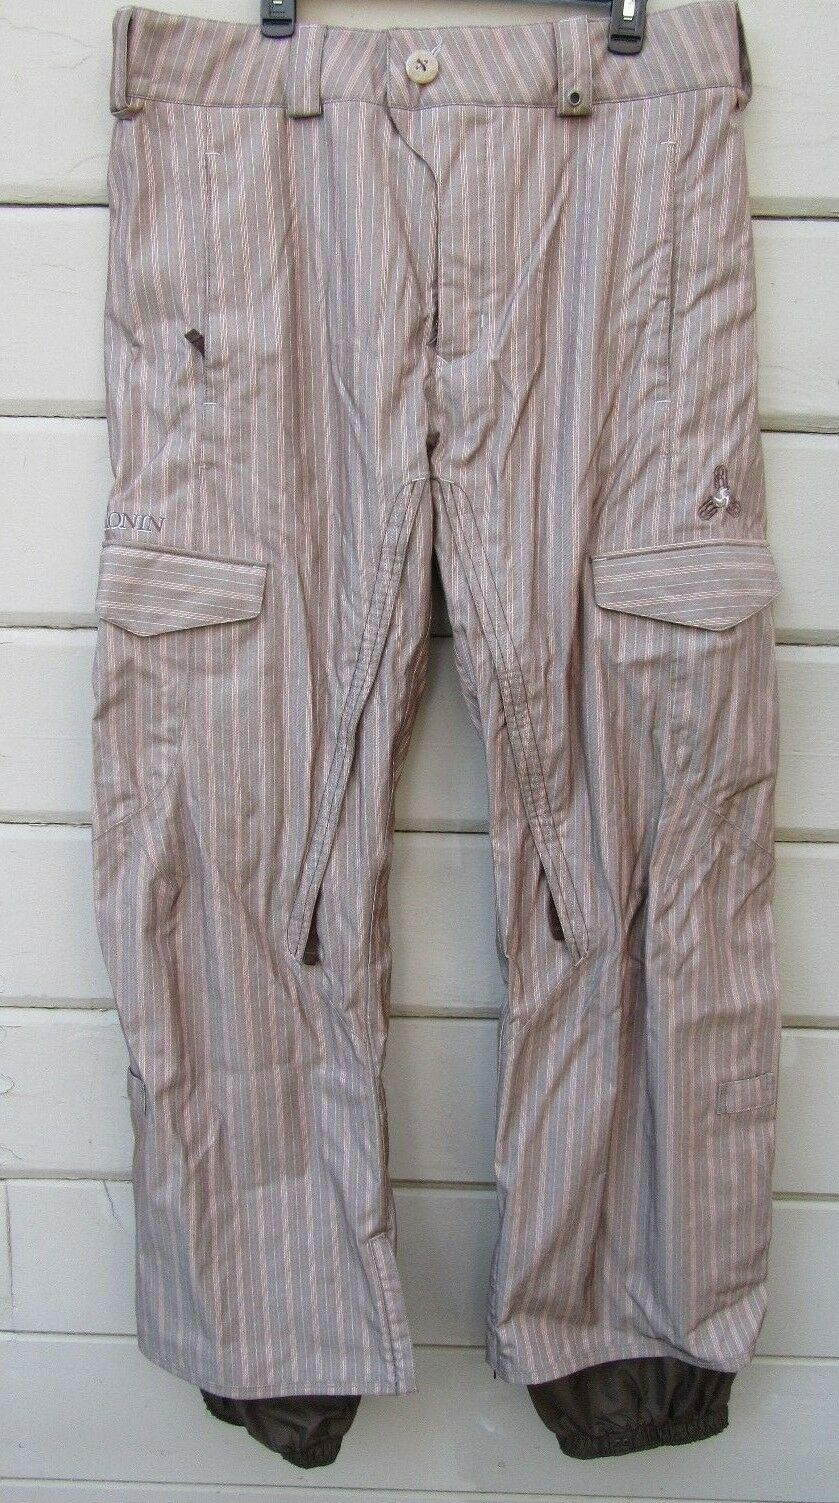 Burton Board Ronin STABLE Pant Uomo XL marrone Pinstriped Board Burton Pants EUC 8cba02